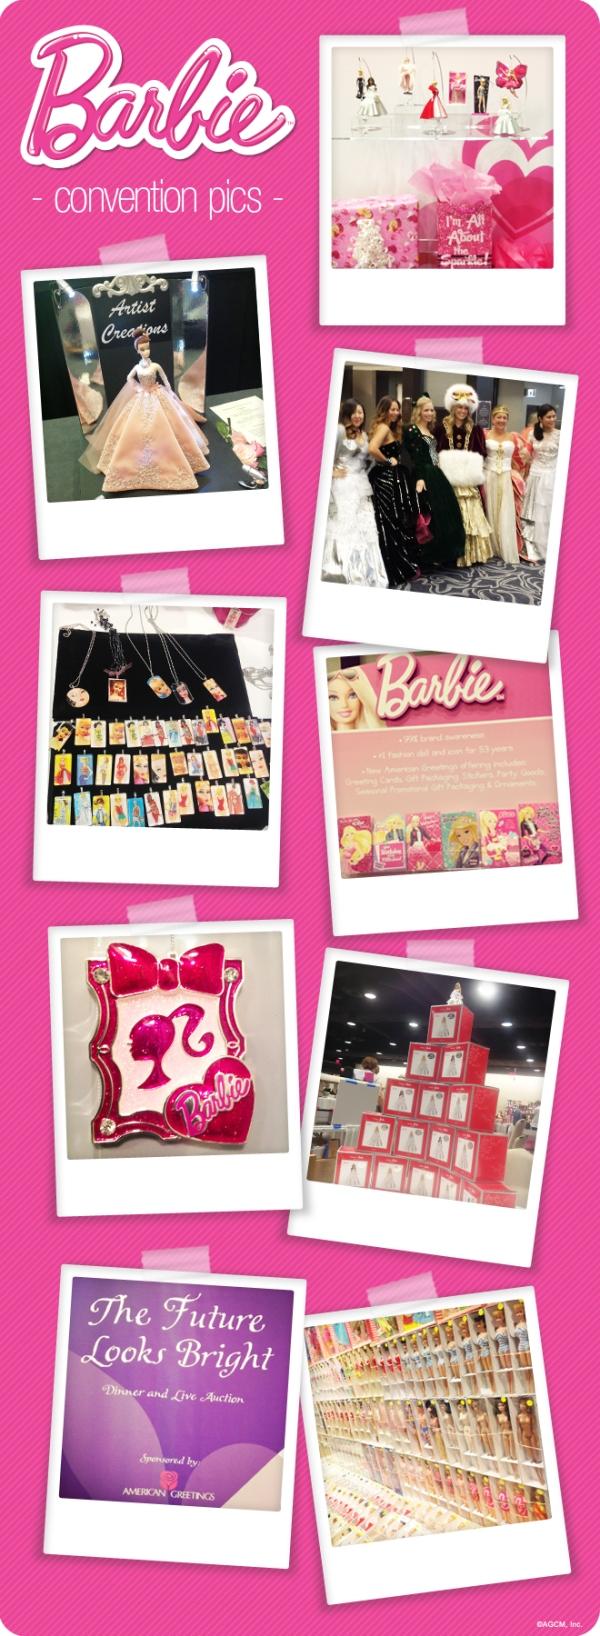 11062013_Barbie_Convention_BLG_AG